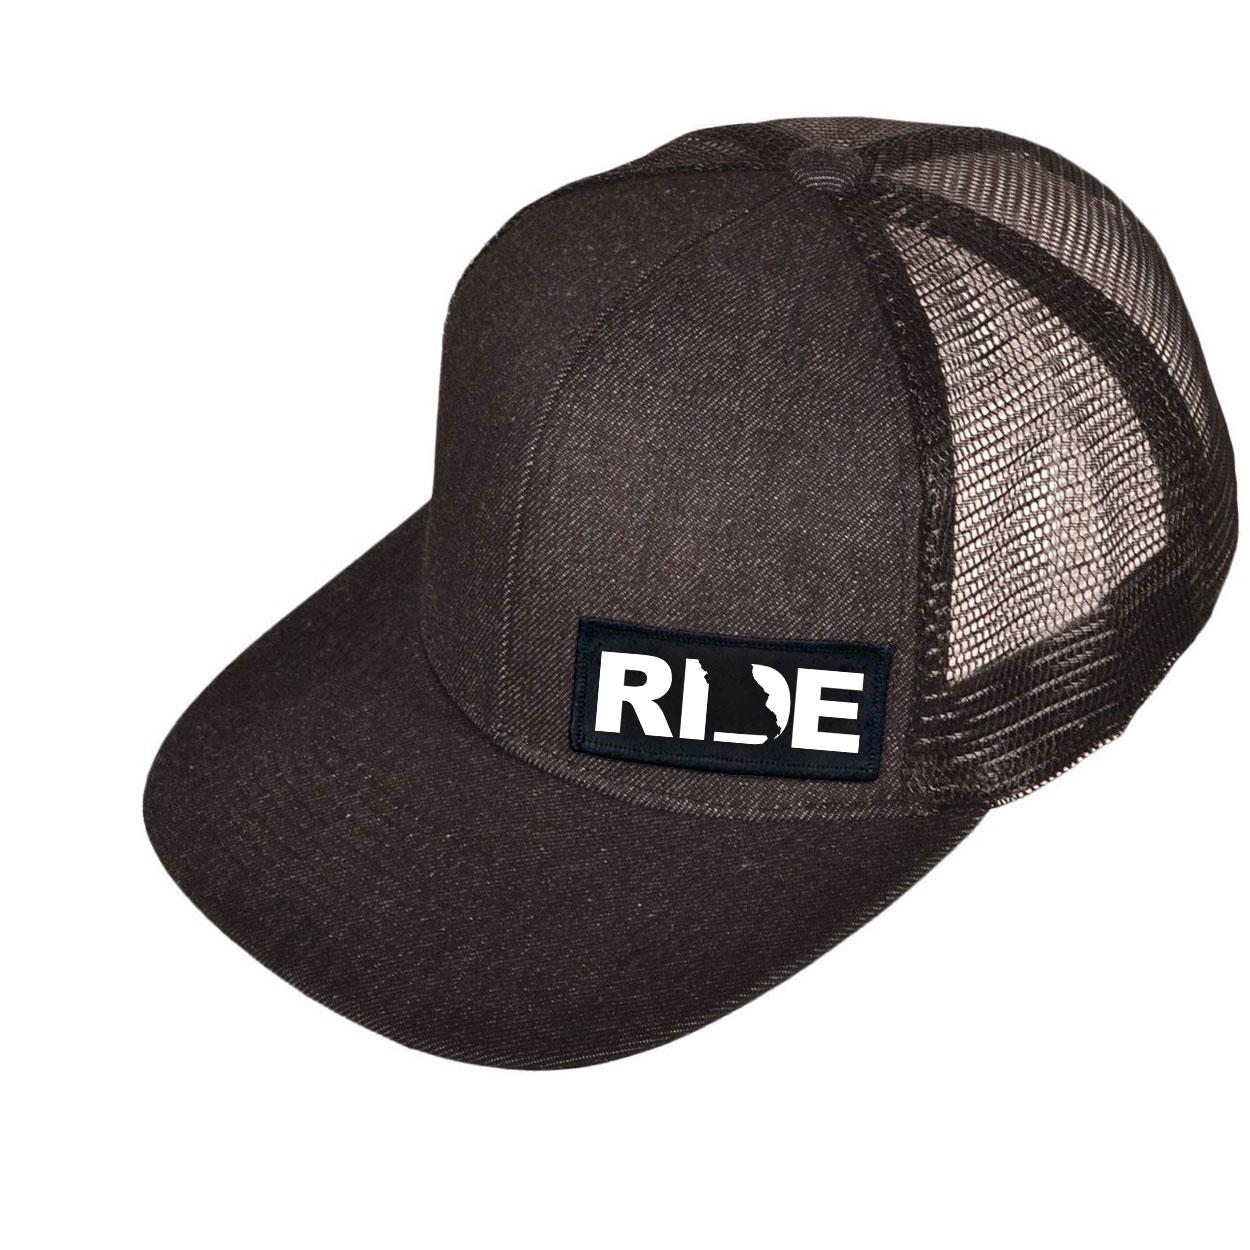 Ride Missouri Night Out Woven Patch Snapback Flat Brim Hat Black Denim (White Logo)